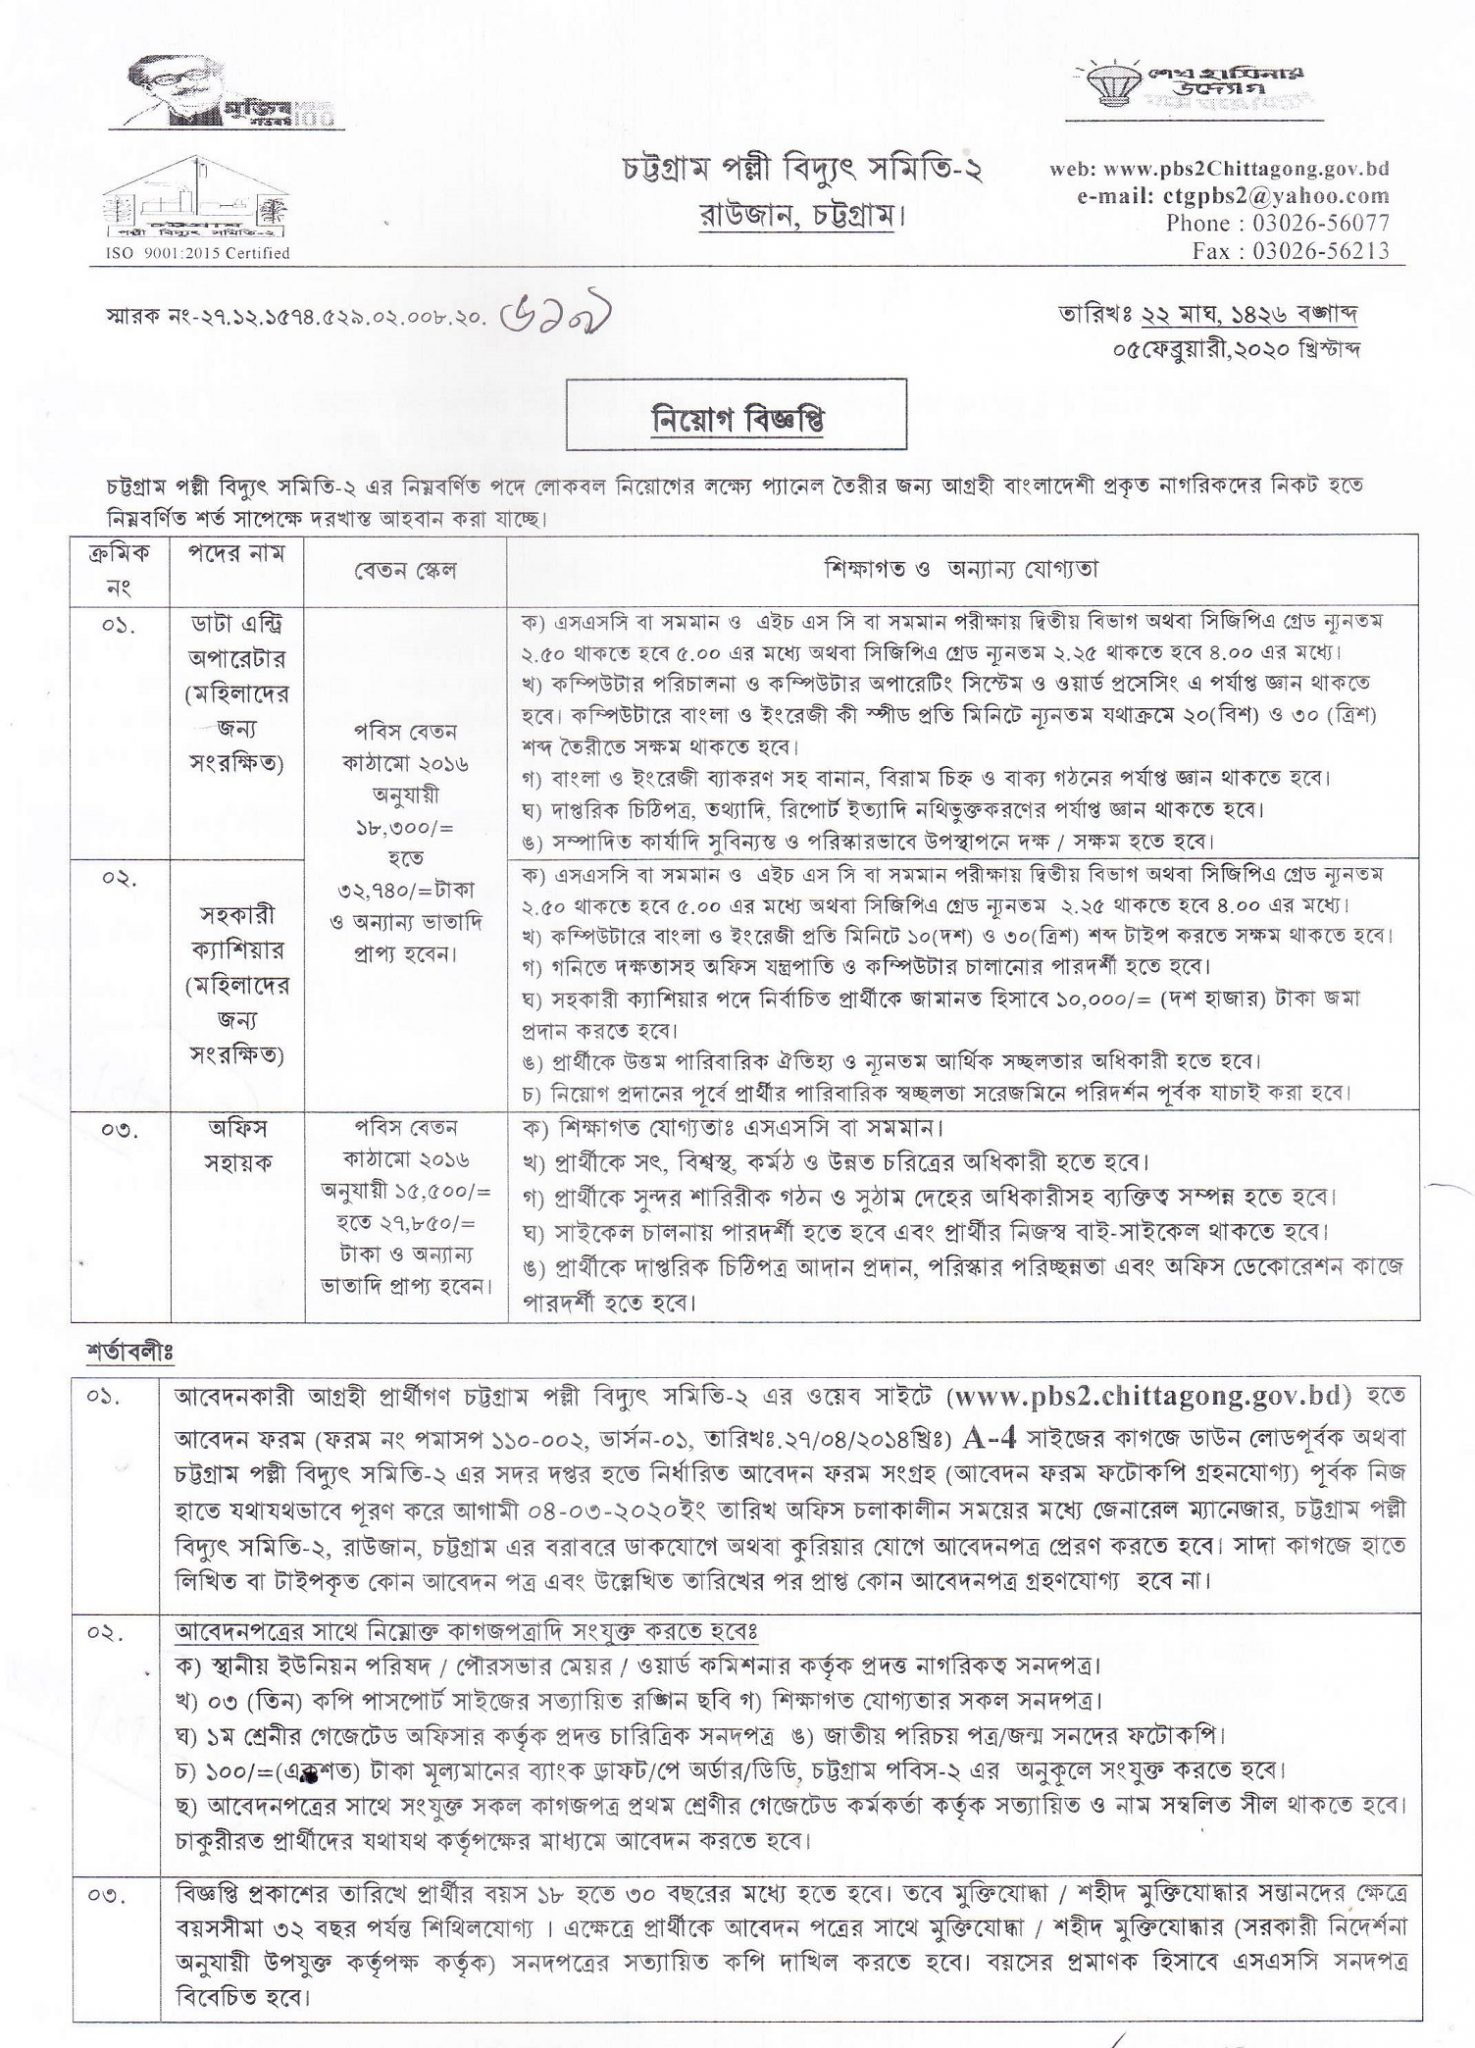 Chittagong Palli bidyut samity PBS-2 Job Circular 2020